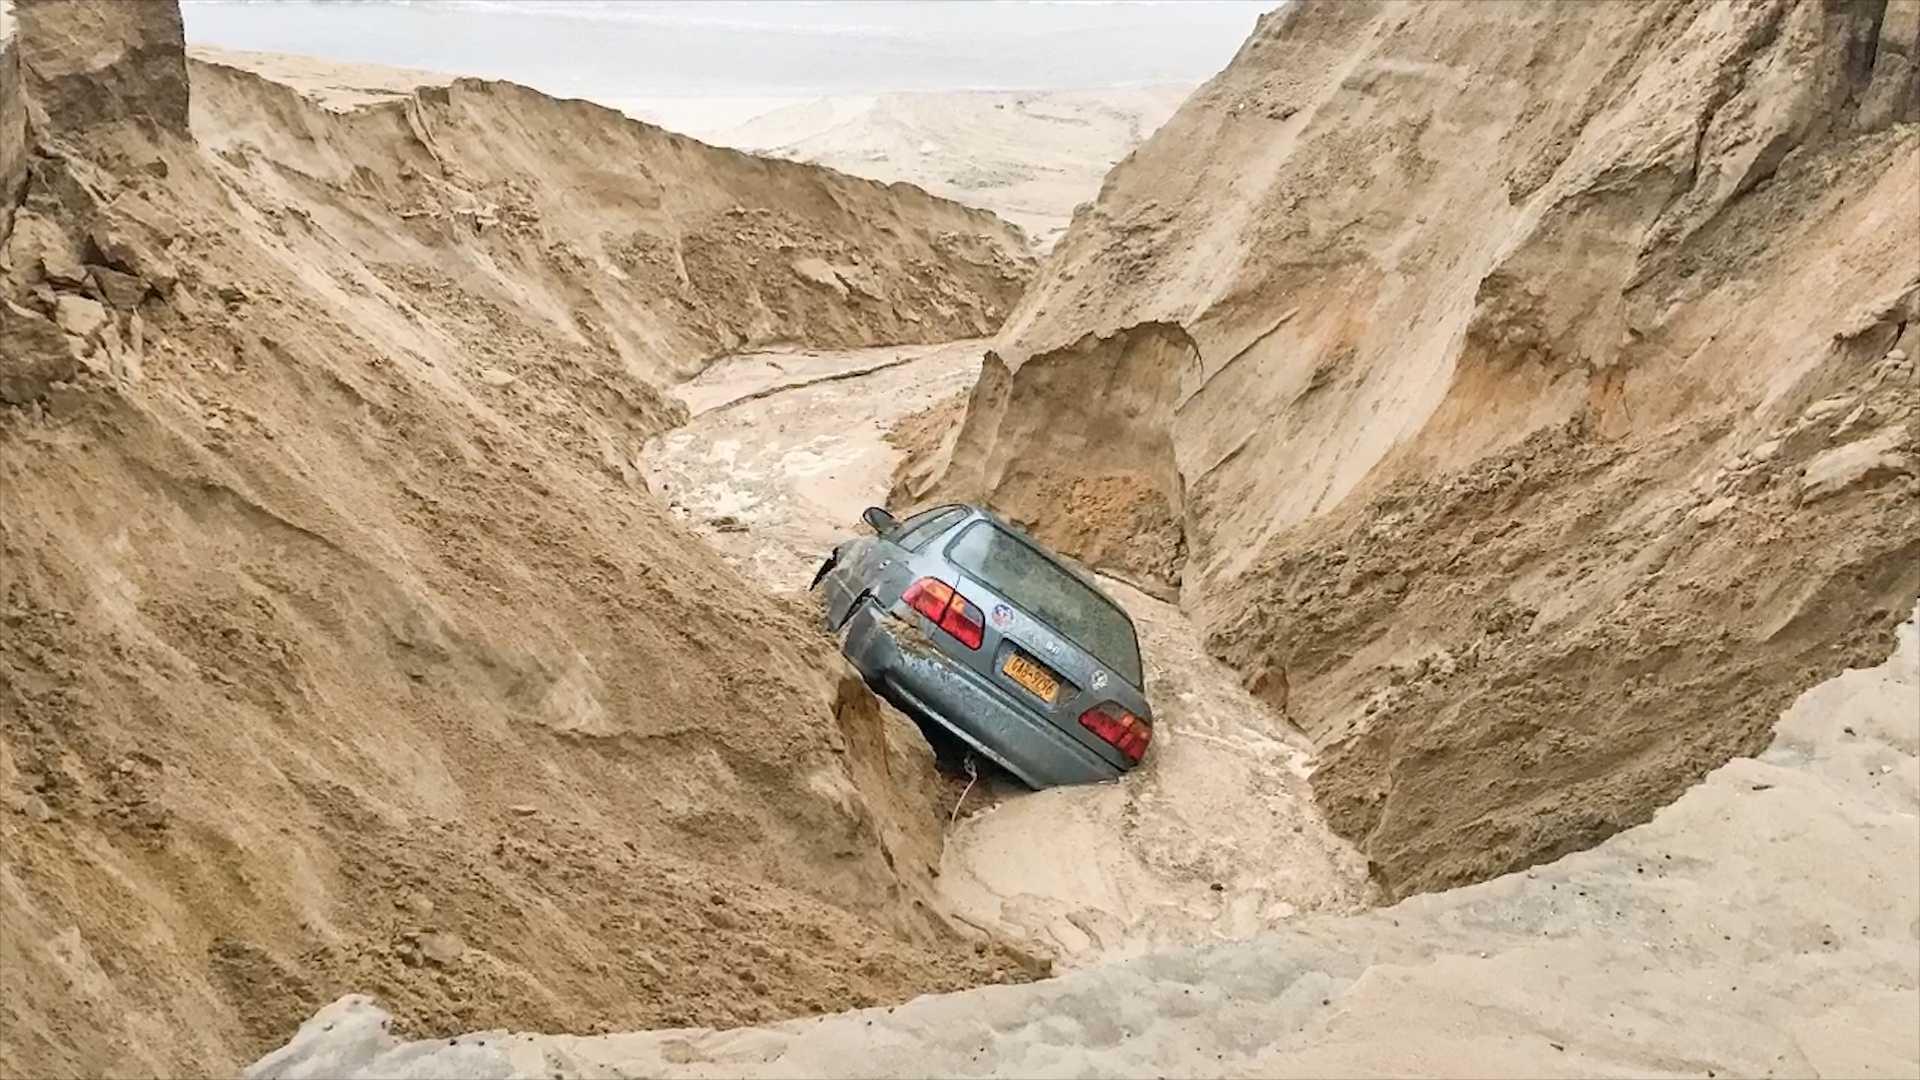 Beachcomber Sand Dune